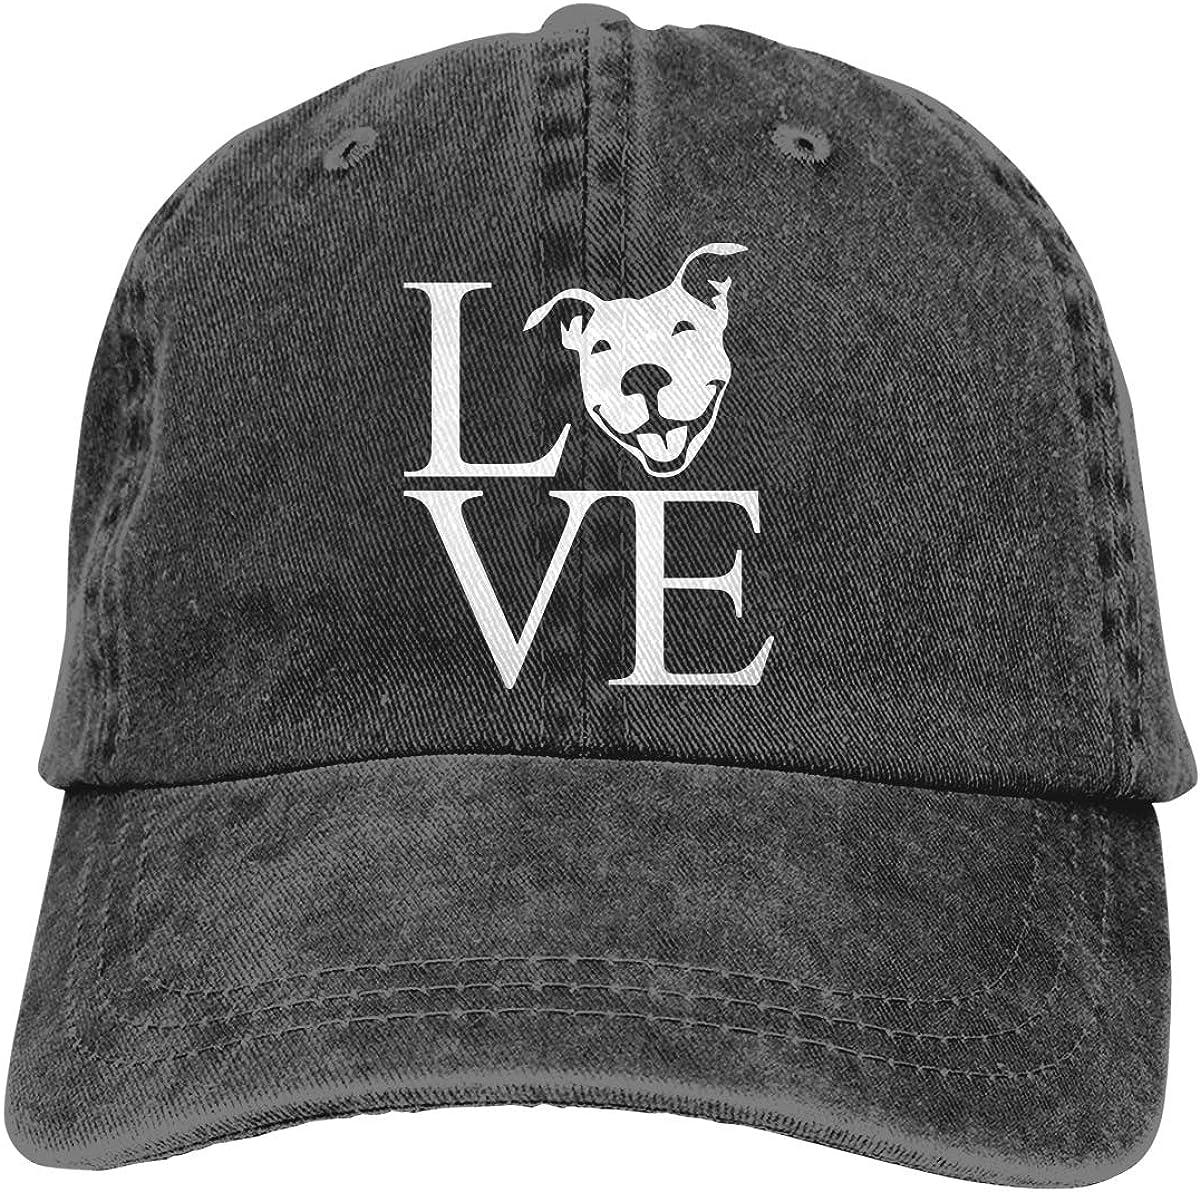 Love Pit Bull Adult Personalize Cowboy Sun Hat Adjustable Baseball Cap